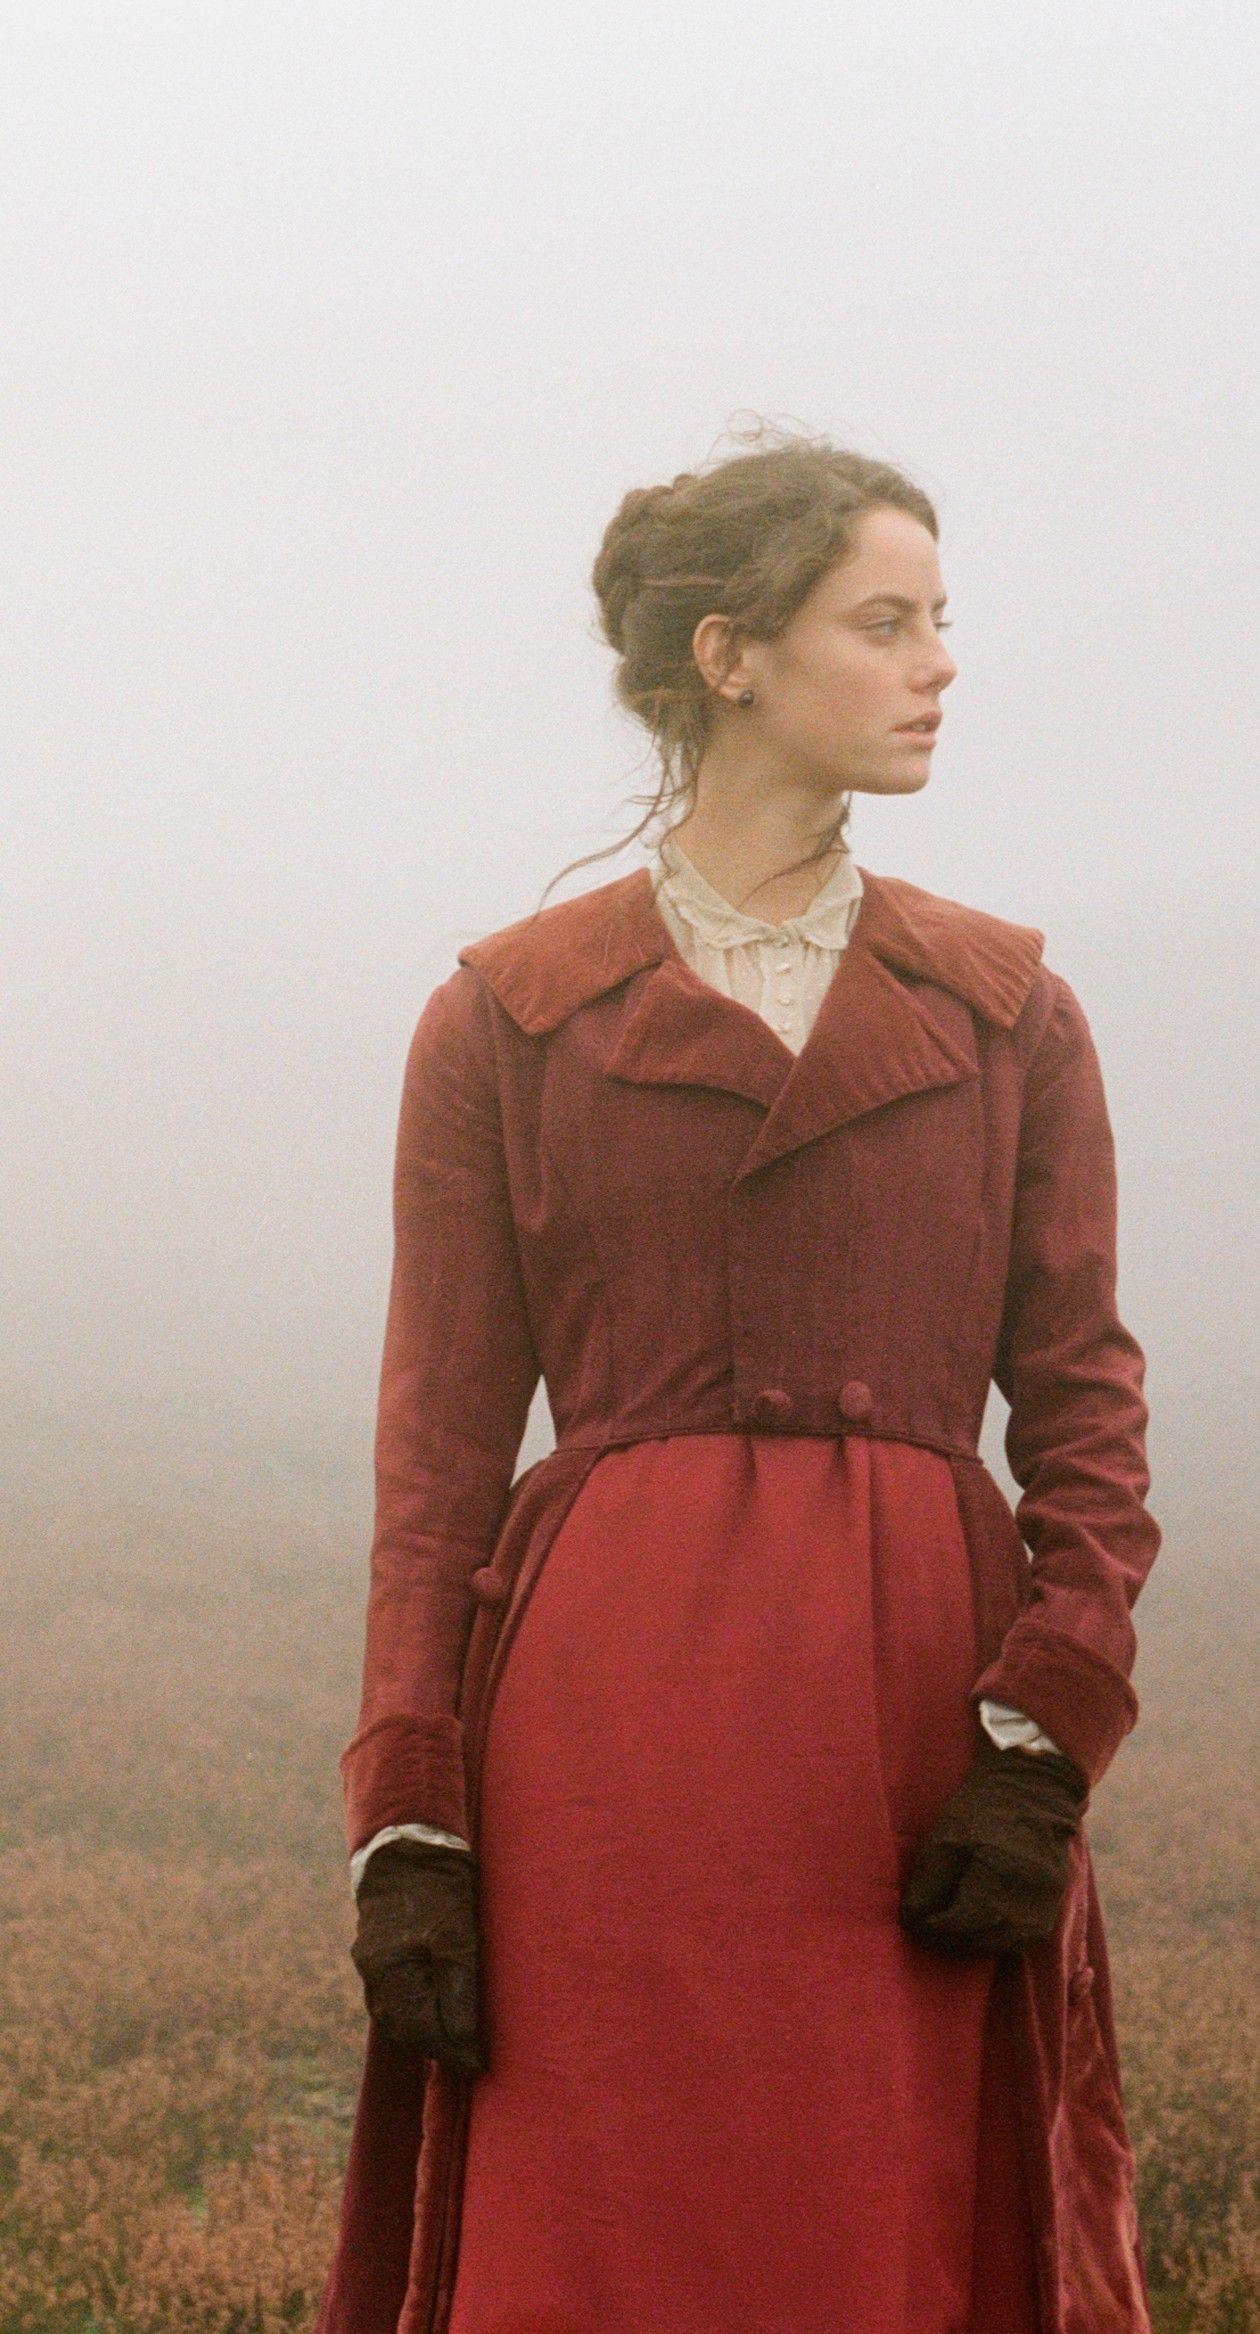 Kaya Scodelario actress / Wuthering Heights / Les Hauts de Hurlevent / Andrea Arnold 2011